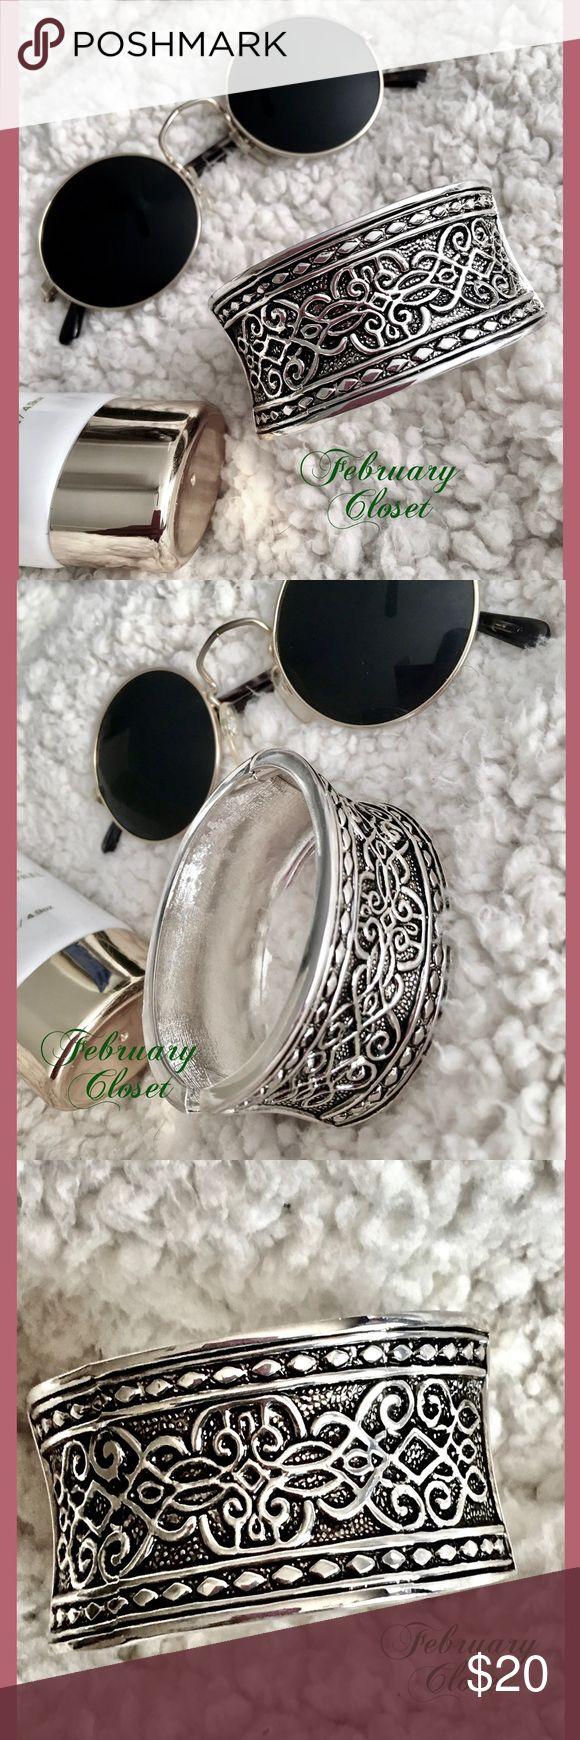 BOHO Hinge Bangle Bracelet Brand new Silver BOHO Hinge Bangle Bracelet. High quality costume jewelry. Beautiful details. Will compliment any wardrobe. NWOT. February Closet Jewelry Bracelets